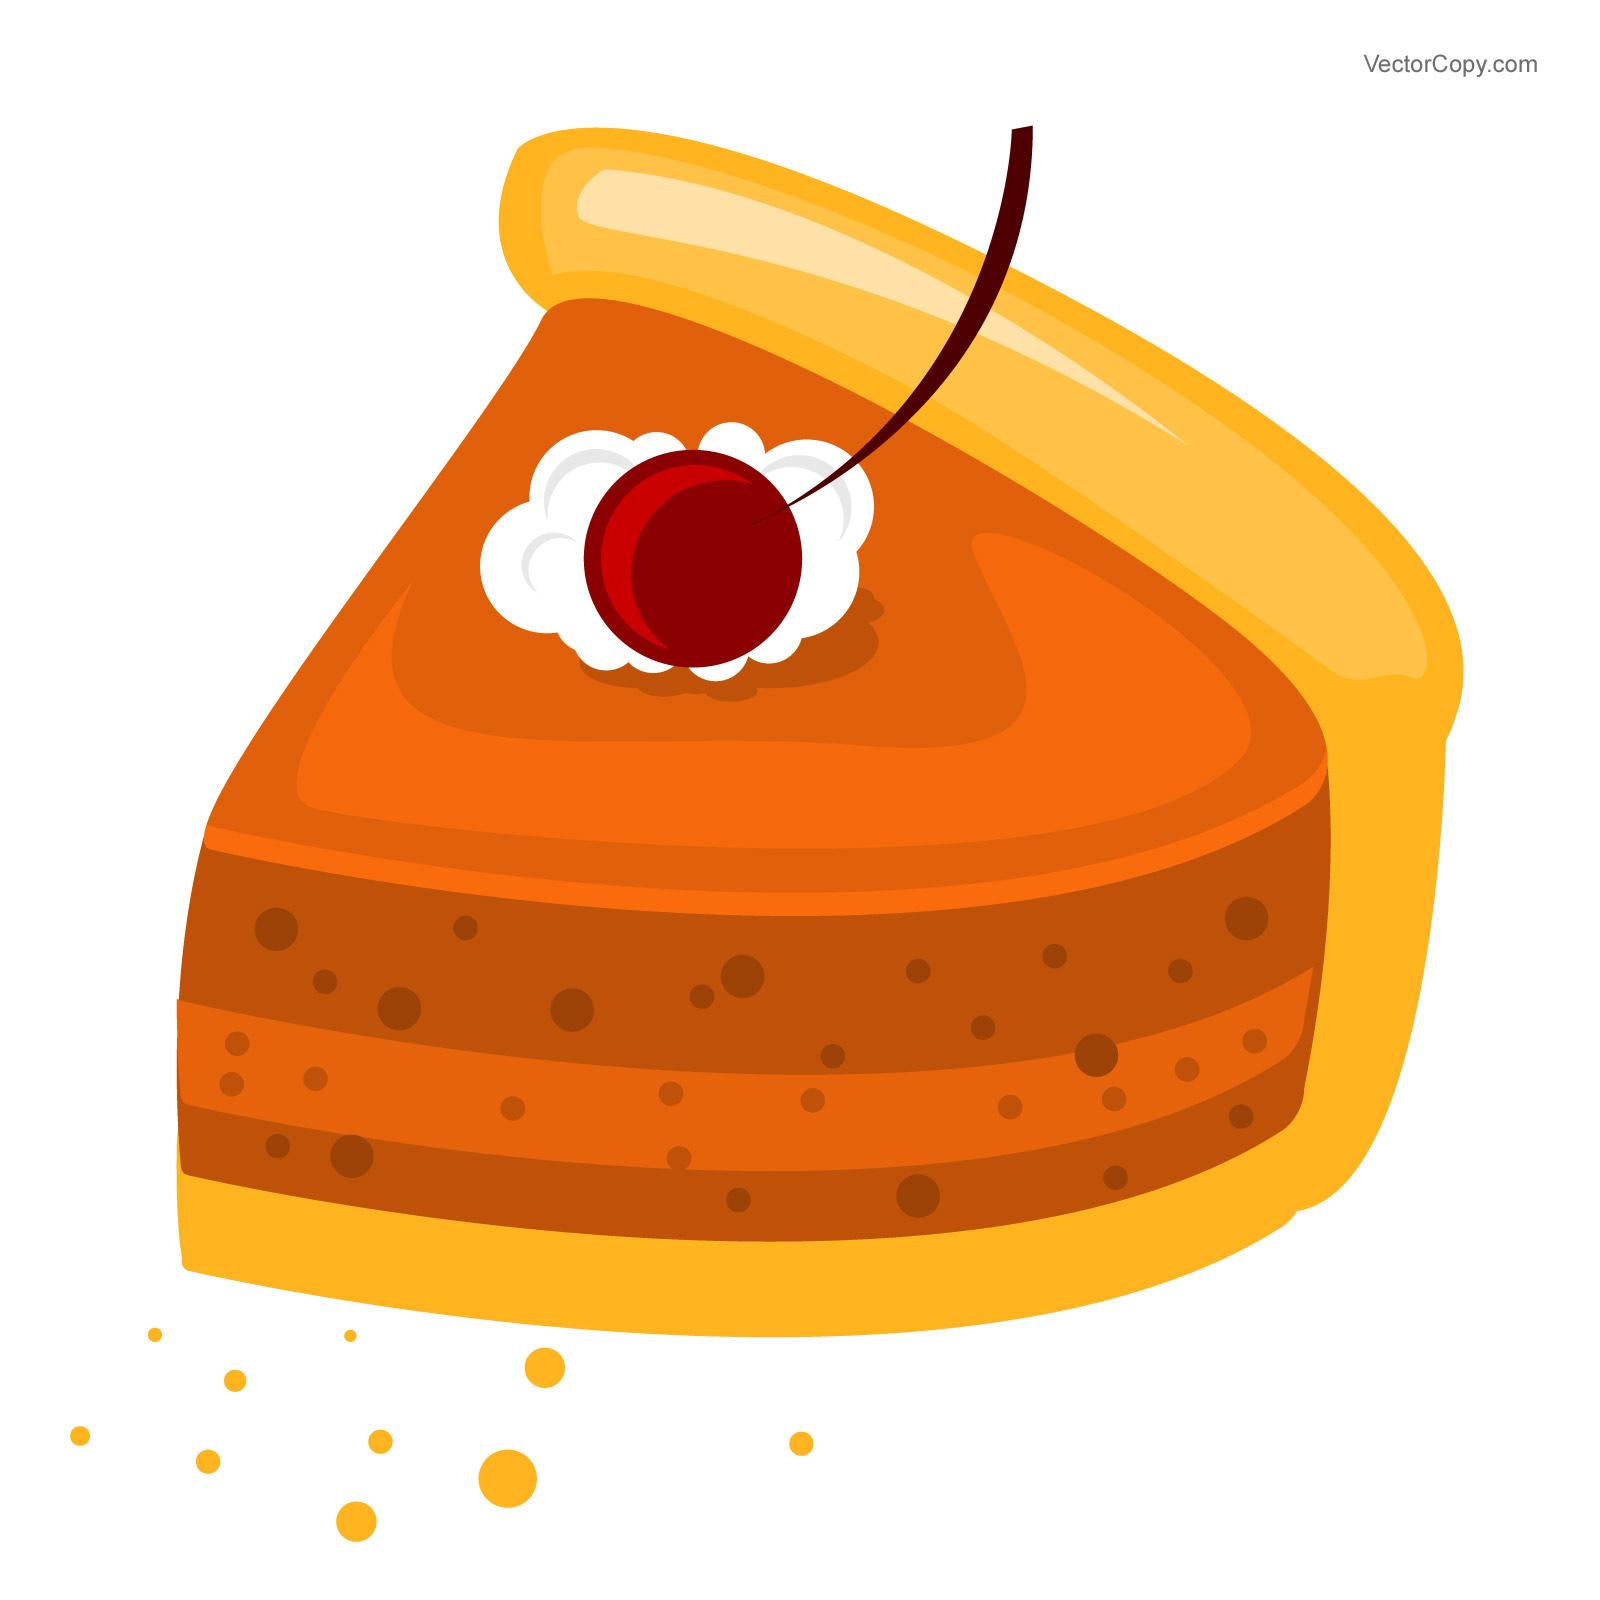 Cake Slice Cartoon Images : Pie Slice Clip Art - ClipArt Best